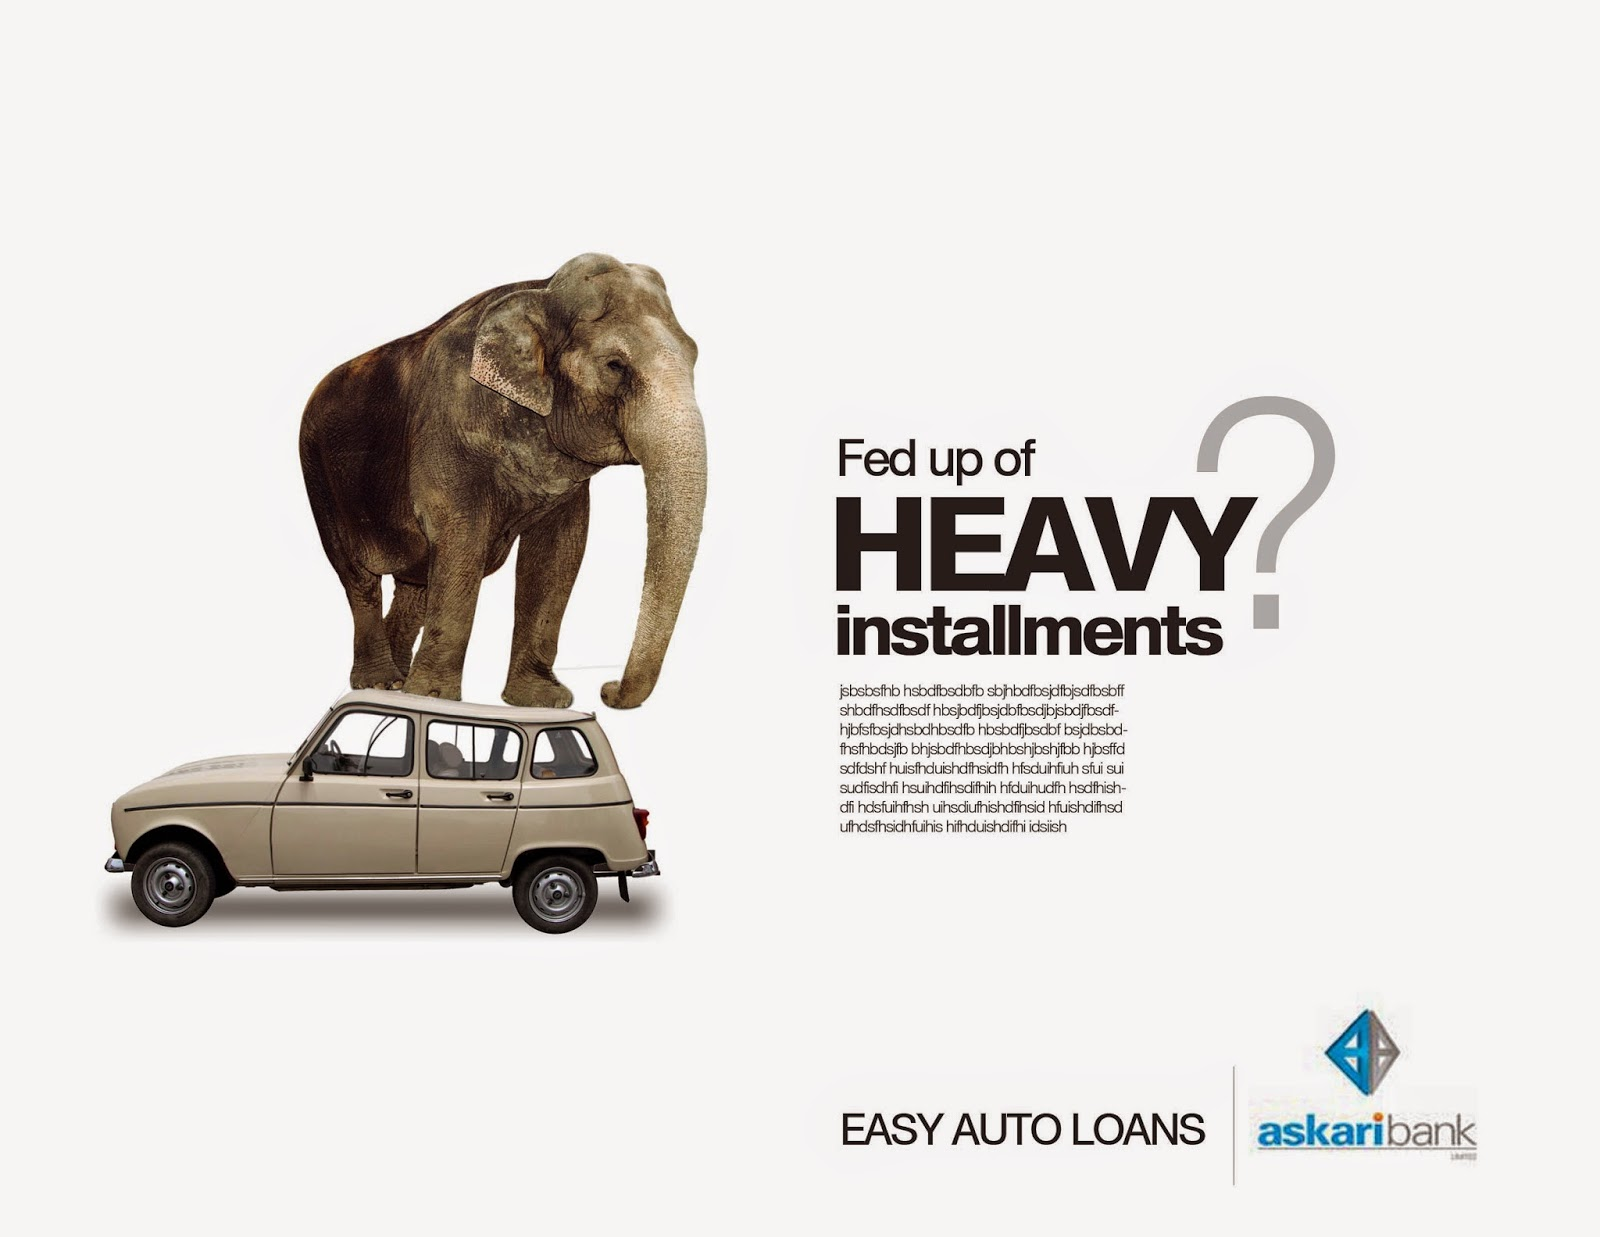 creative advertising ideas: easy car loan advertisement idea